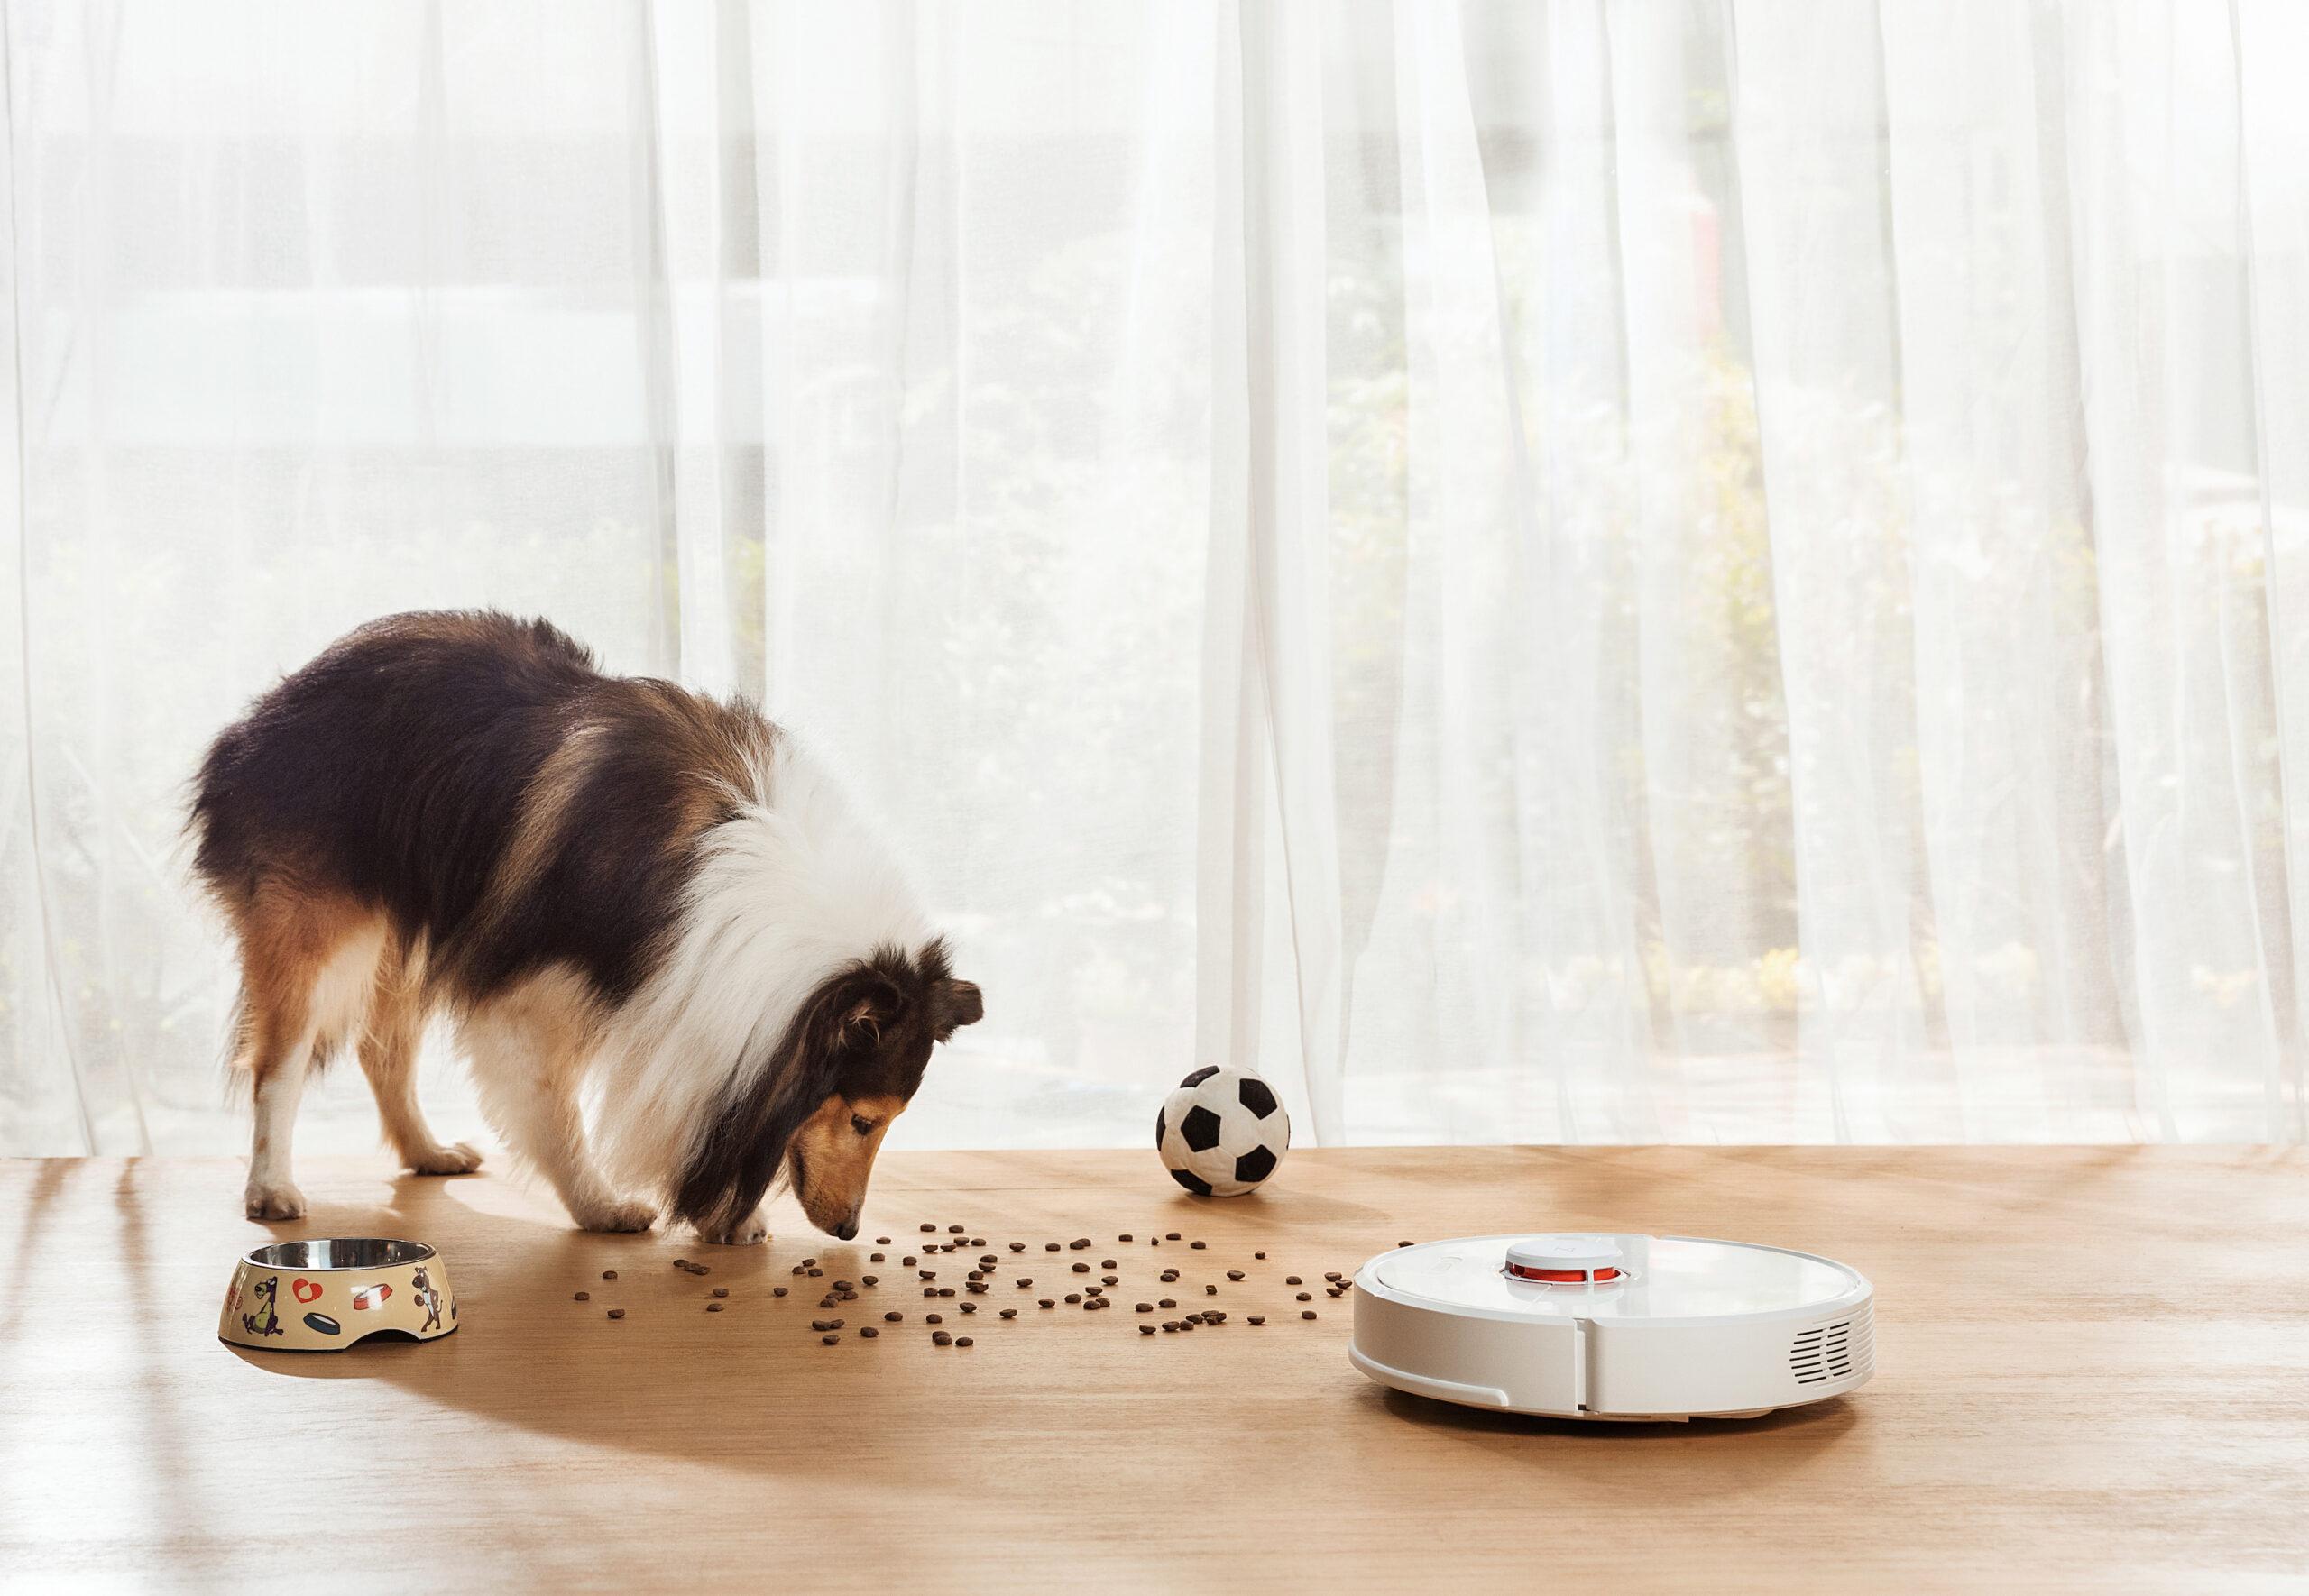 roborock s6 robot vacuum cleaner featured